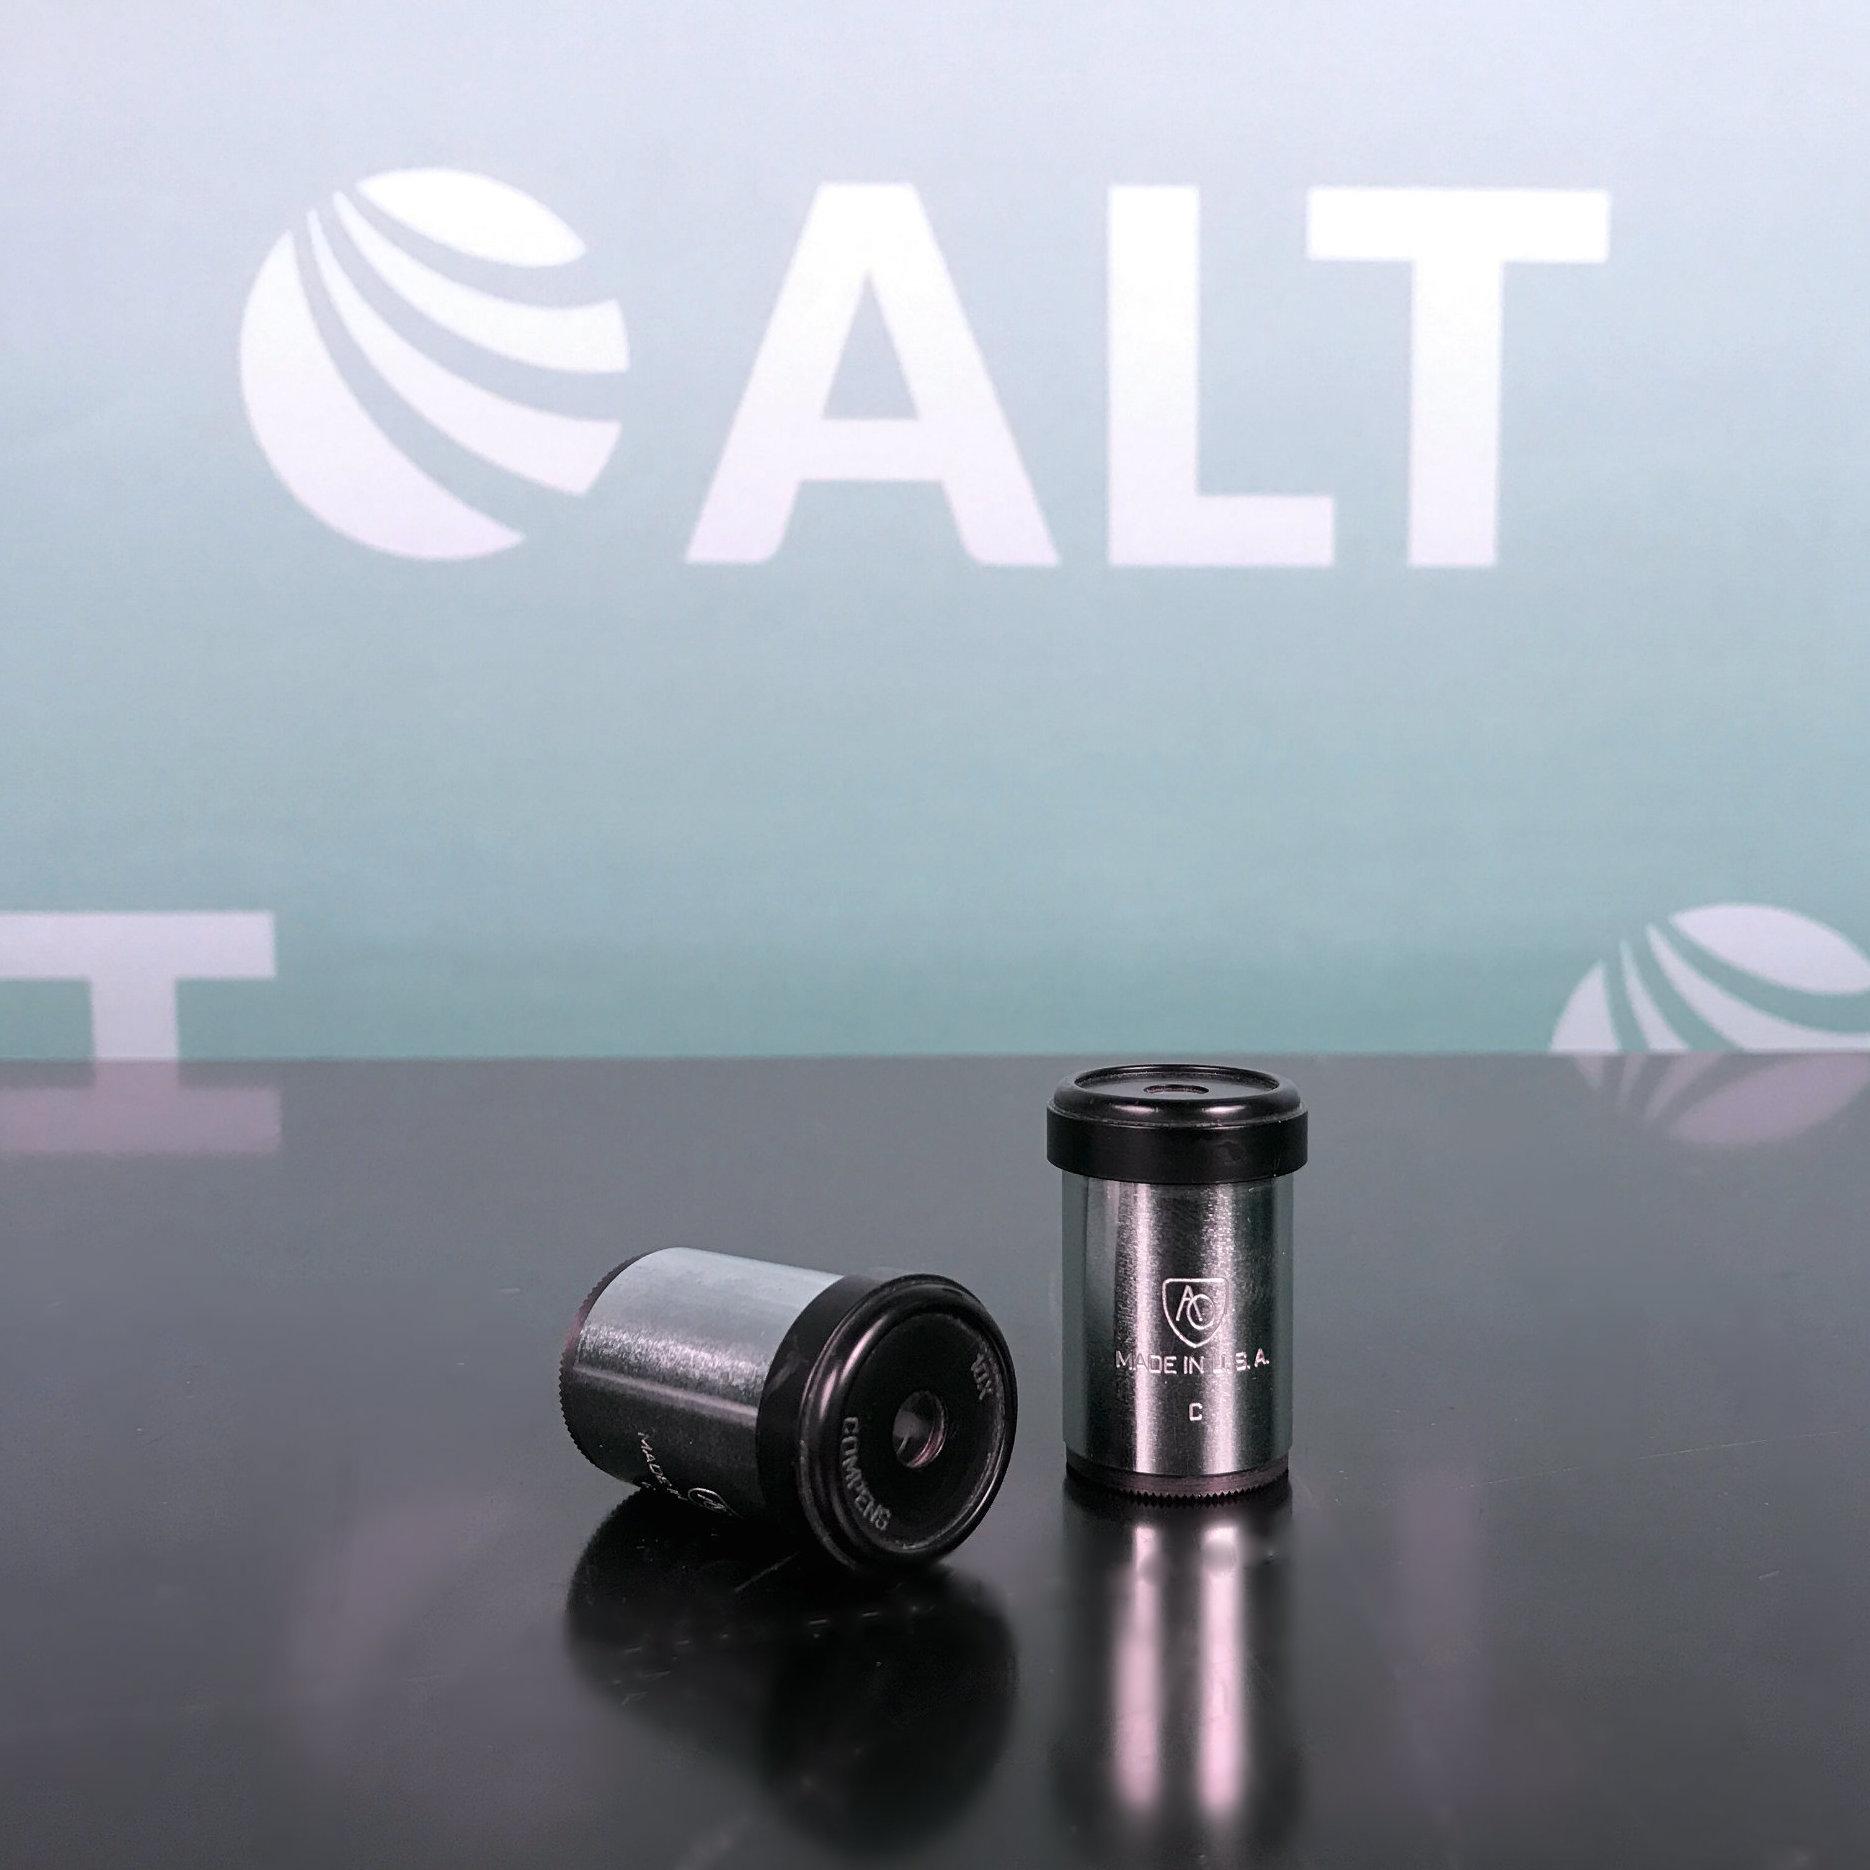 10 x Microscope Ocular Lens Name